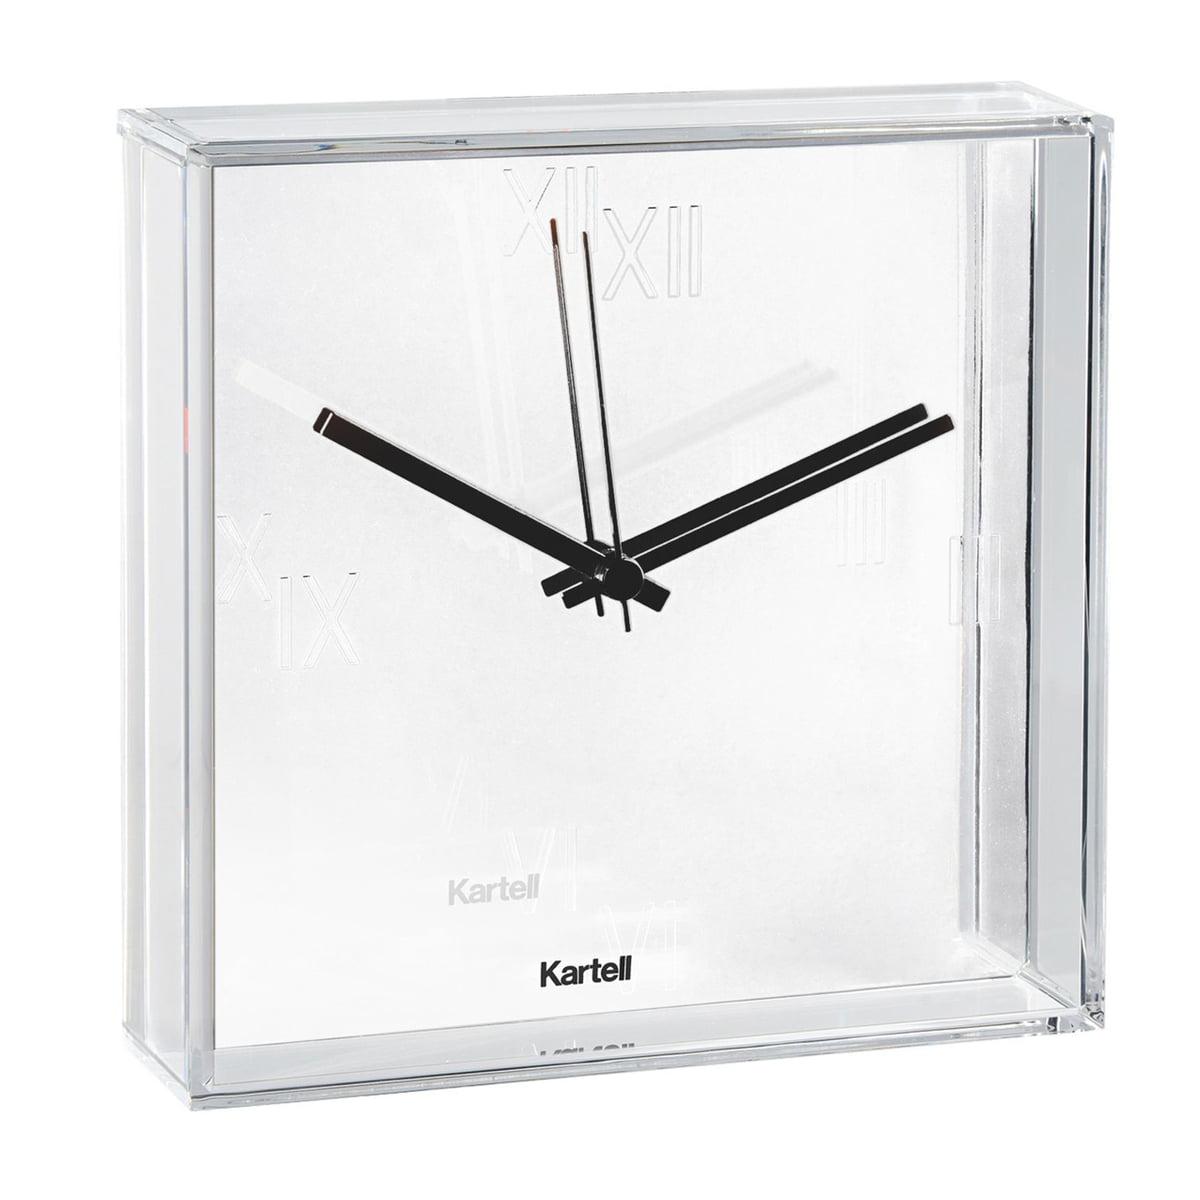 tic  tac wall clock  kartell  shop - kartell  tic  tac wall clock white